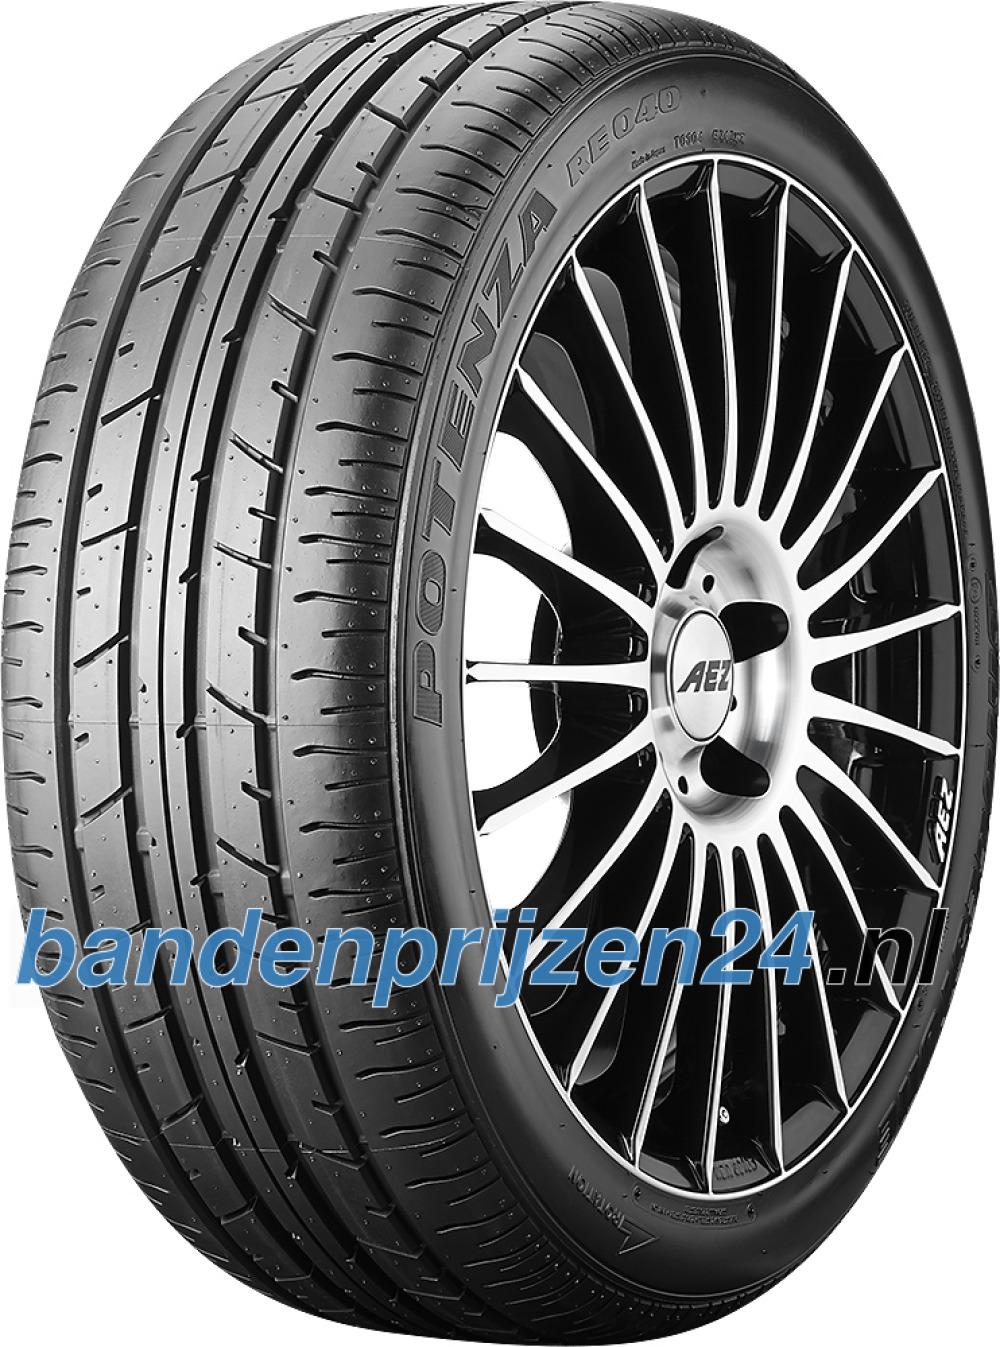 Bridgestone Potenza RE 040 ( 205/55 R16 91W AO )